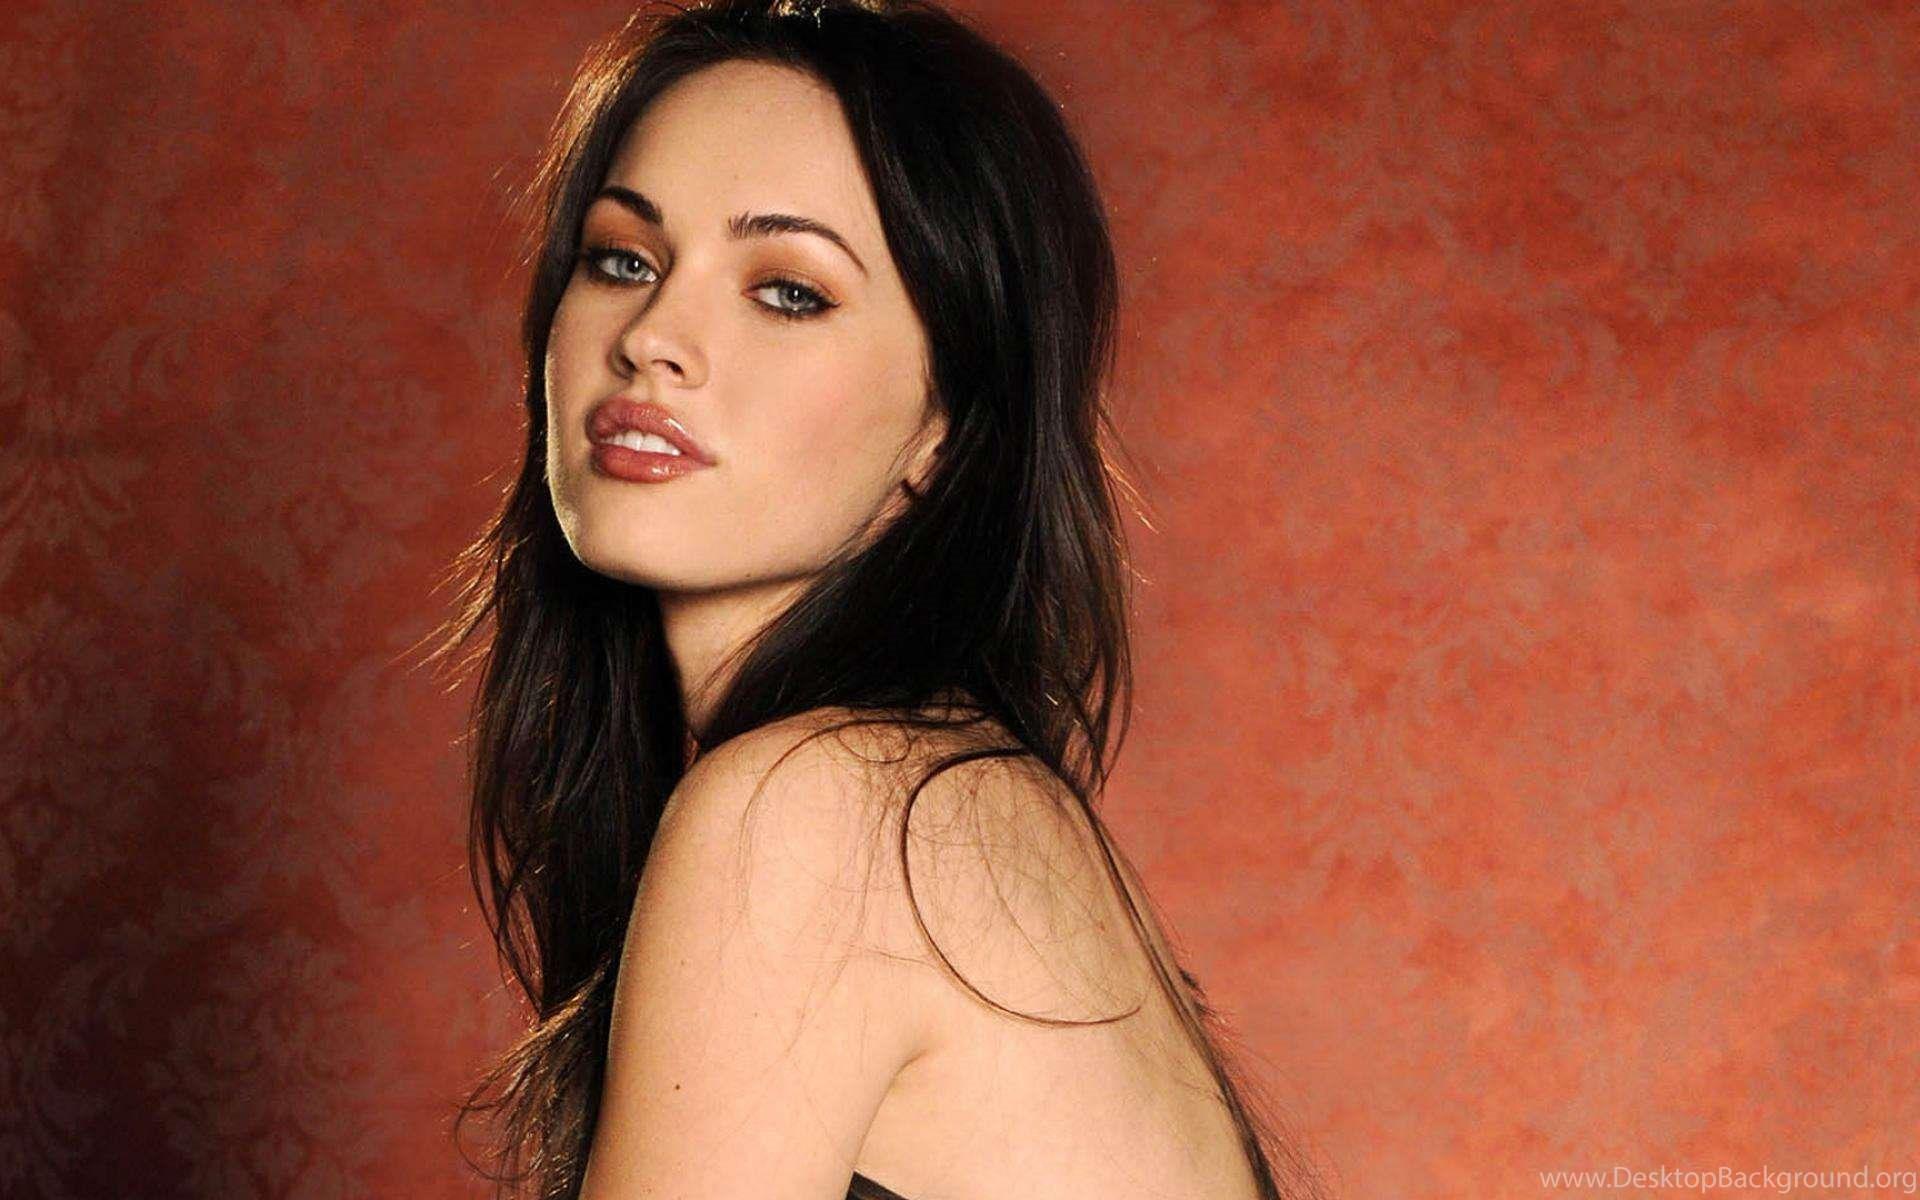 hot beautiful girls wallpapers desktop background